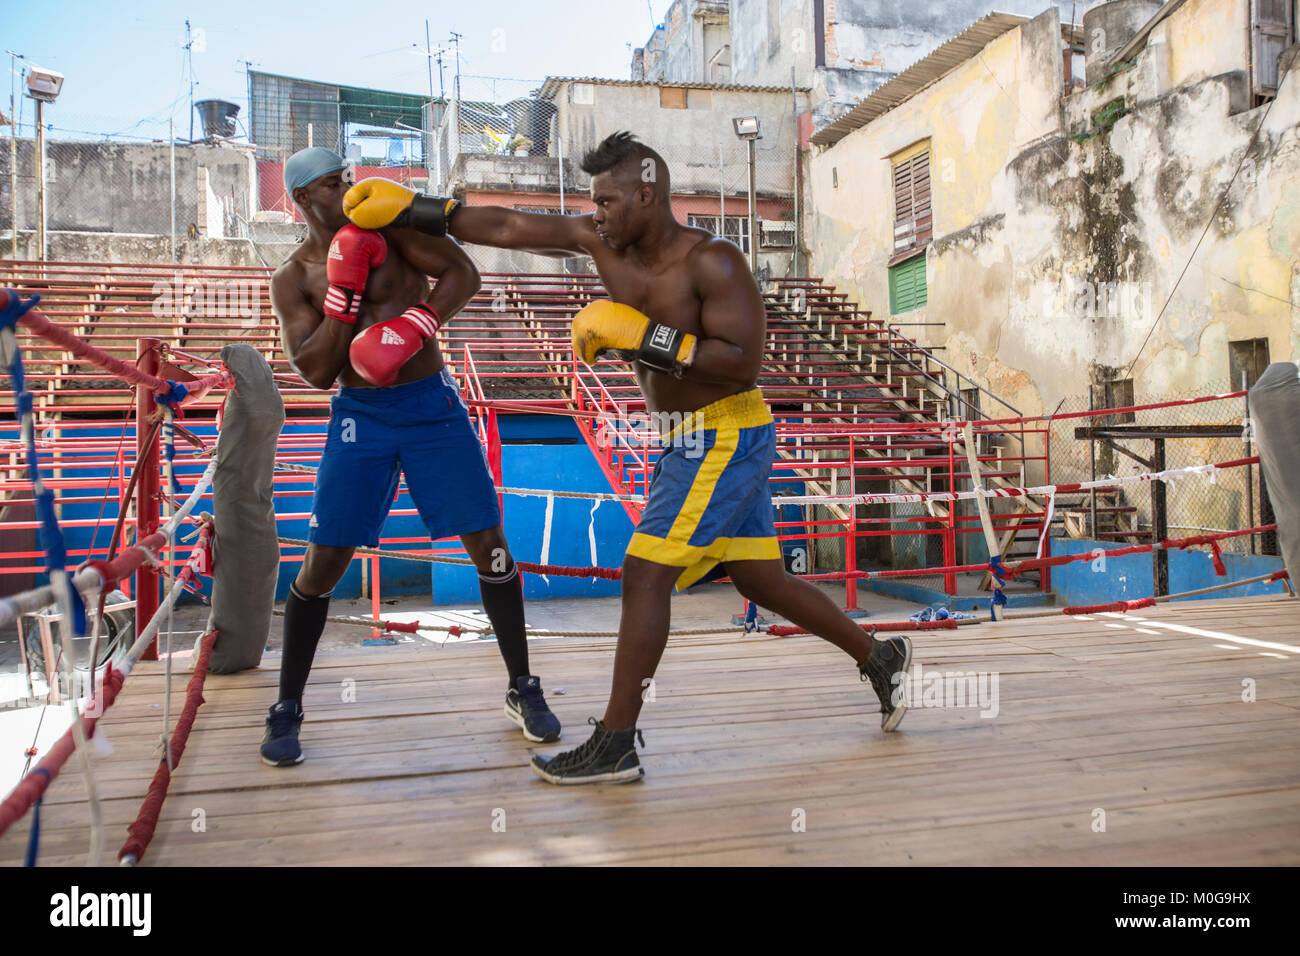 Boxers training at  Rafael Trejo Boxing Gym in Havana, Cuba - Stock Image